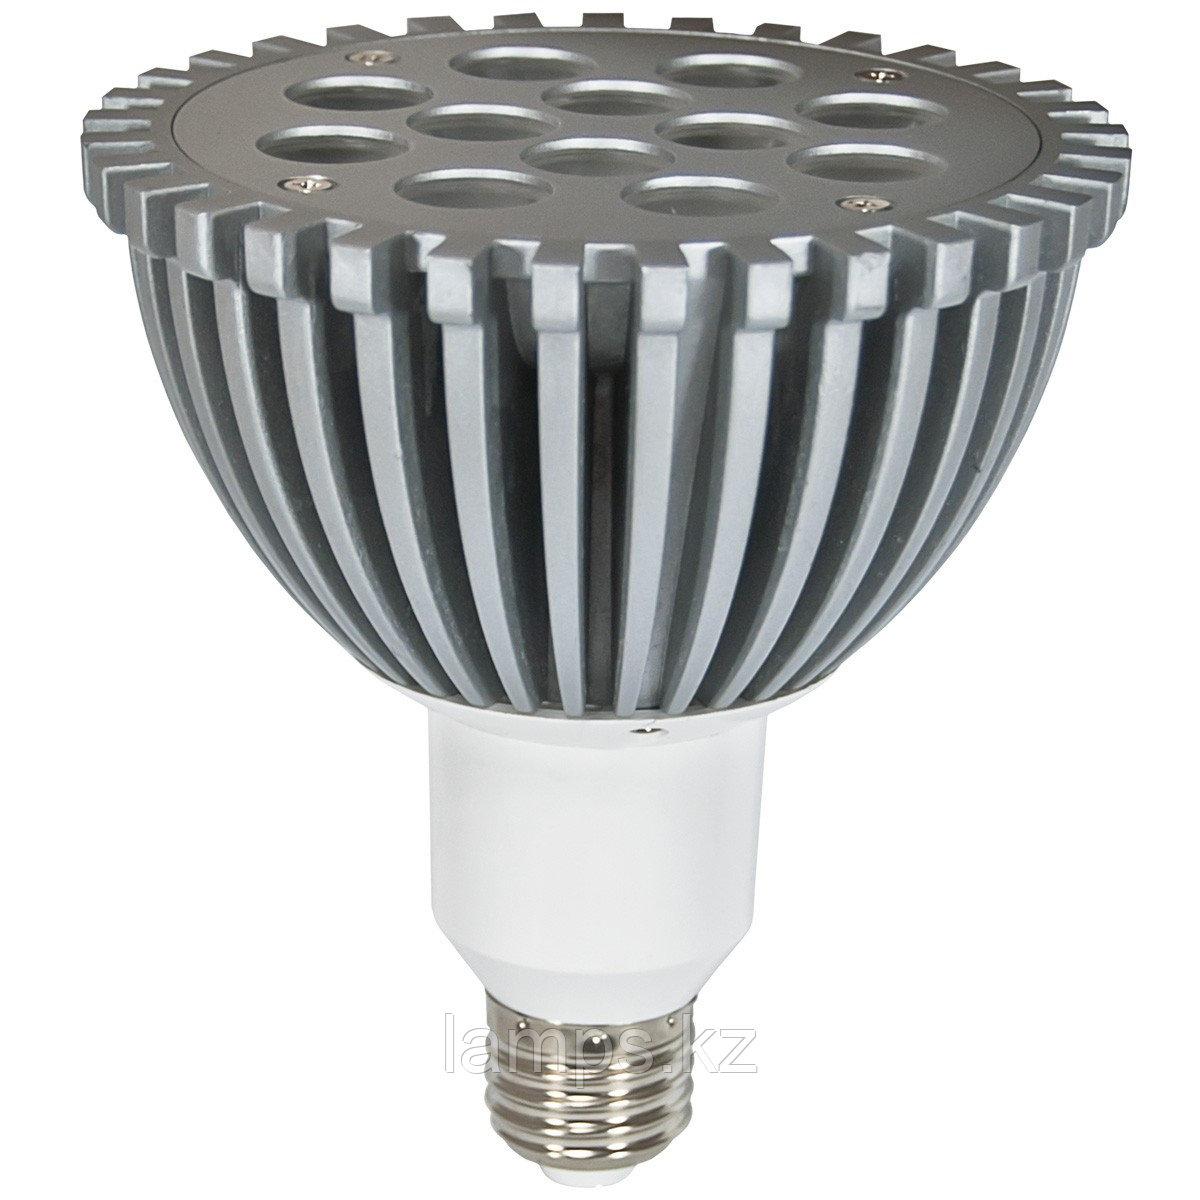 Светодиодная лампа LED PAR T013 12W 220V E27